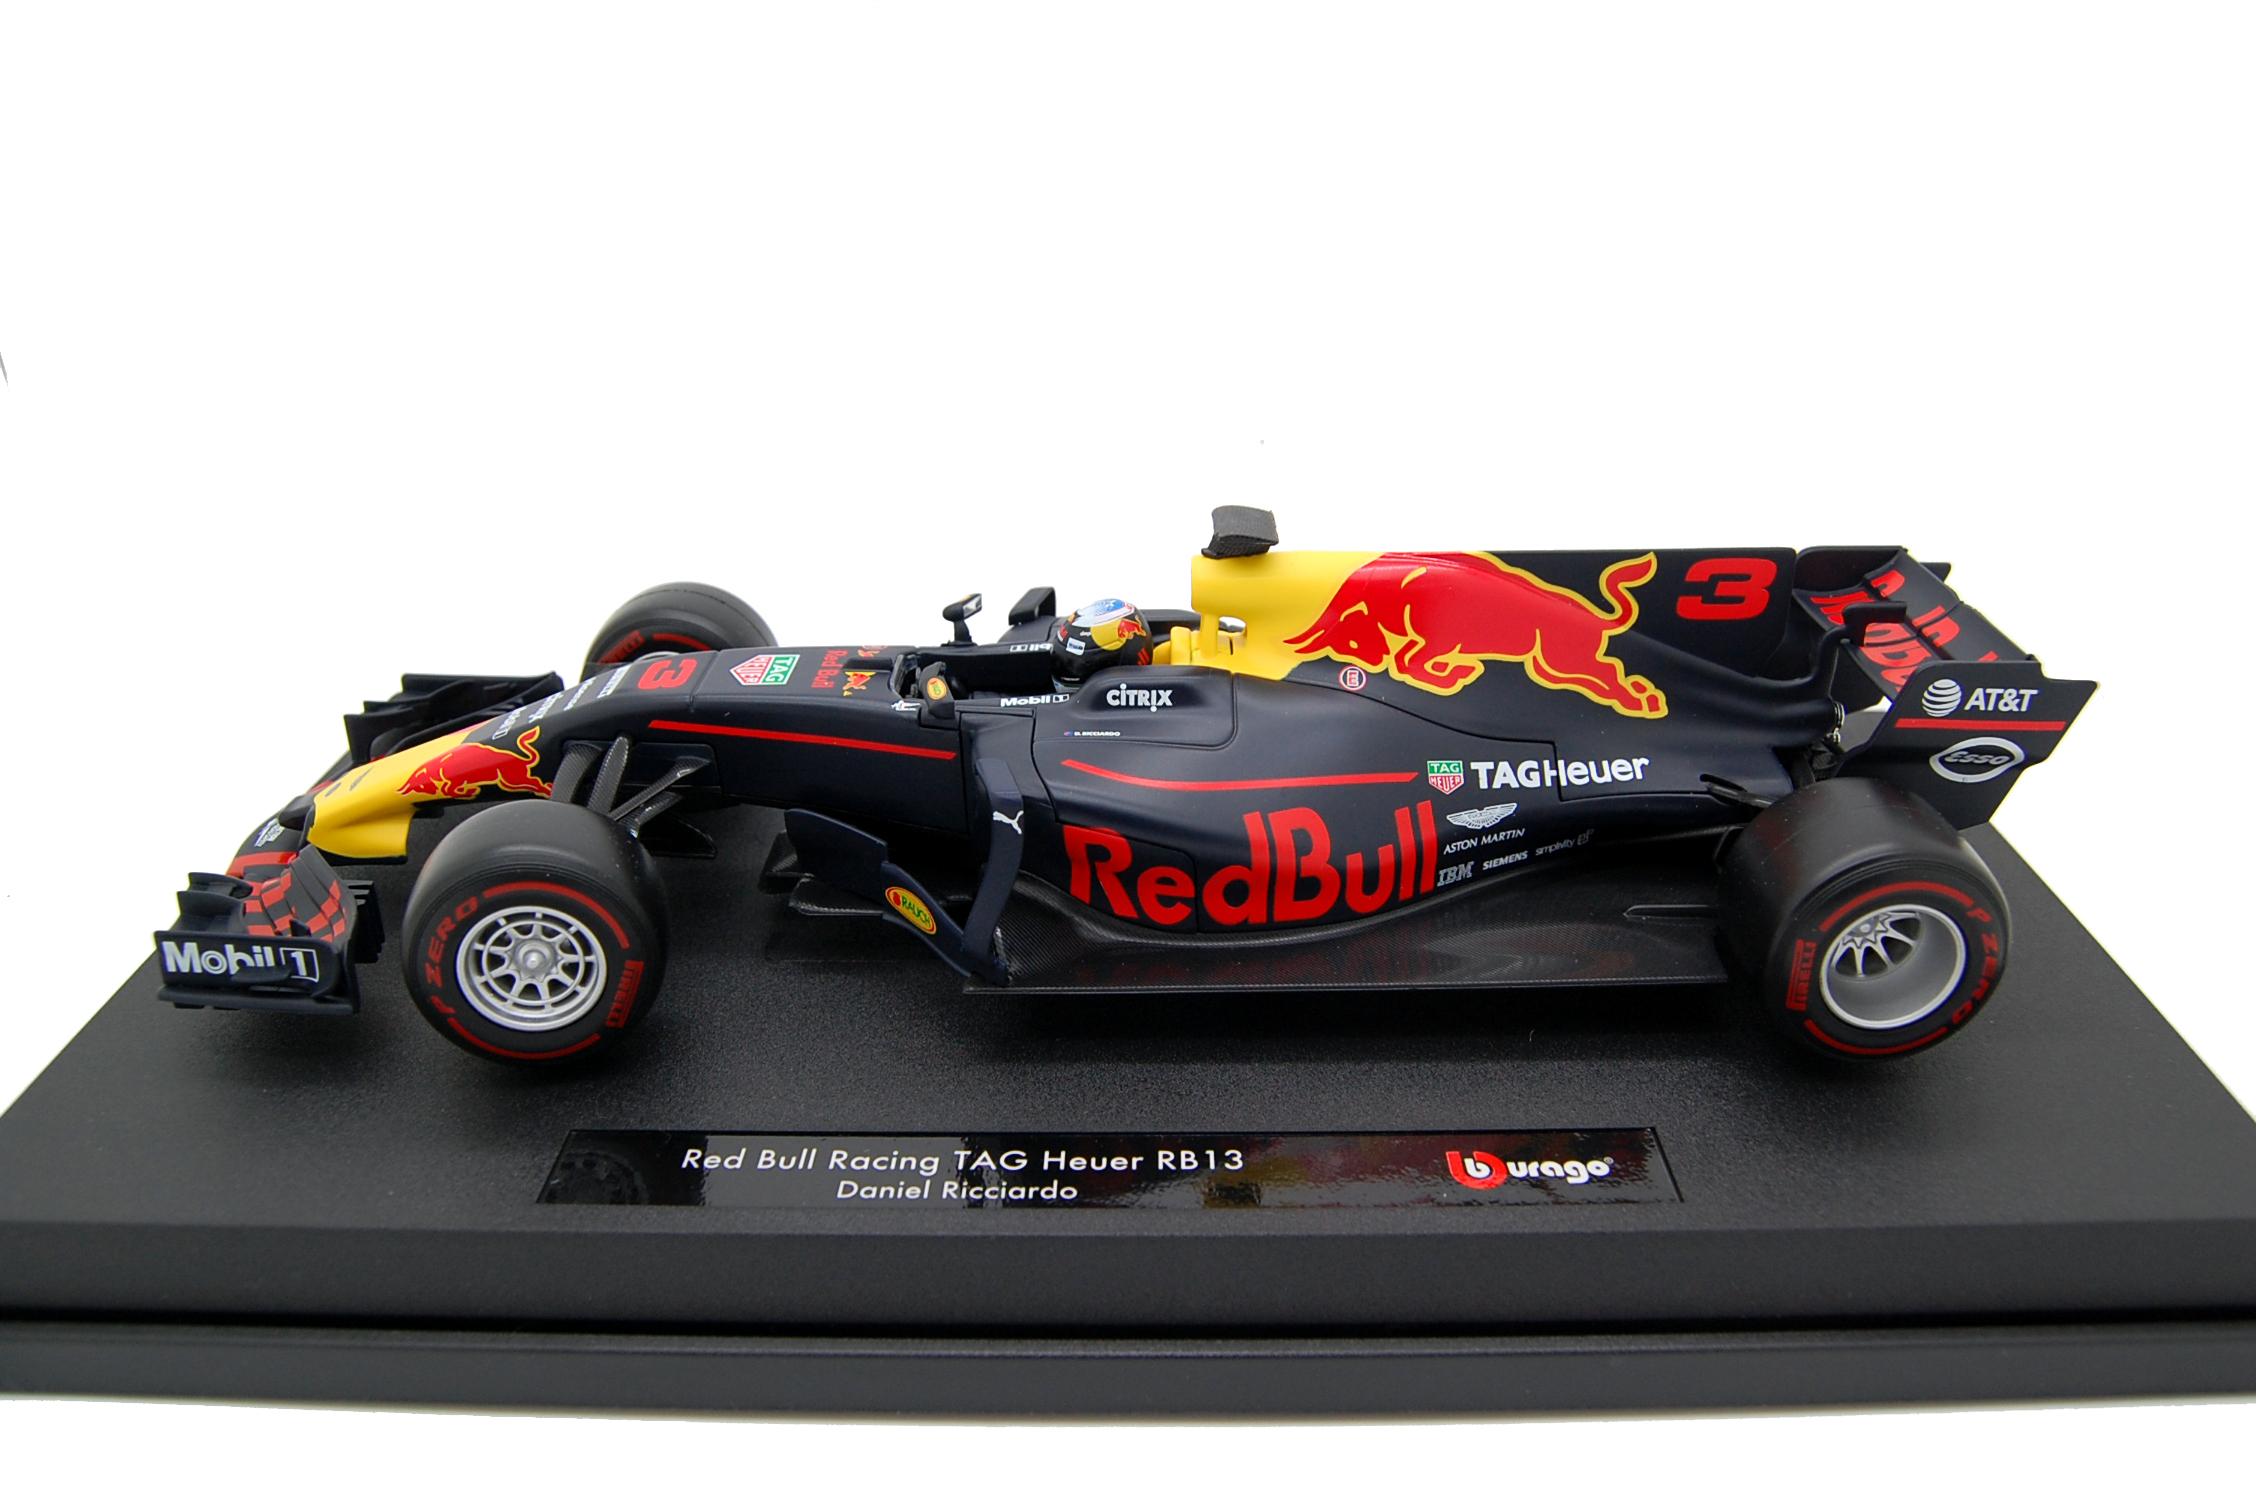 Red Bull RB 13 Ricciardo